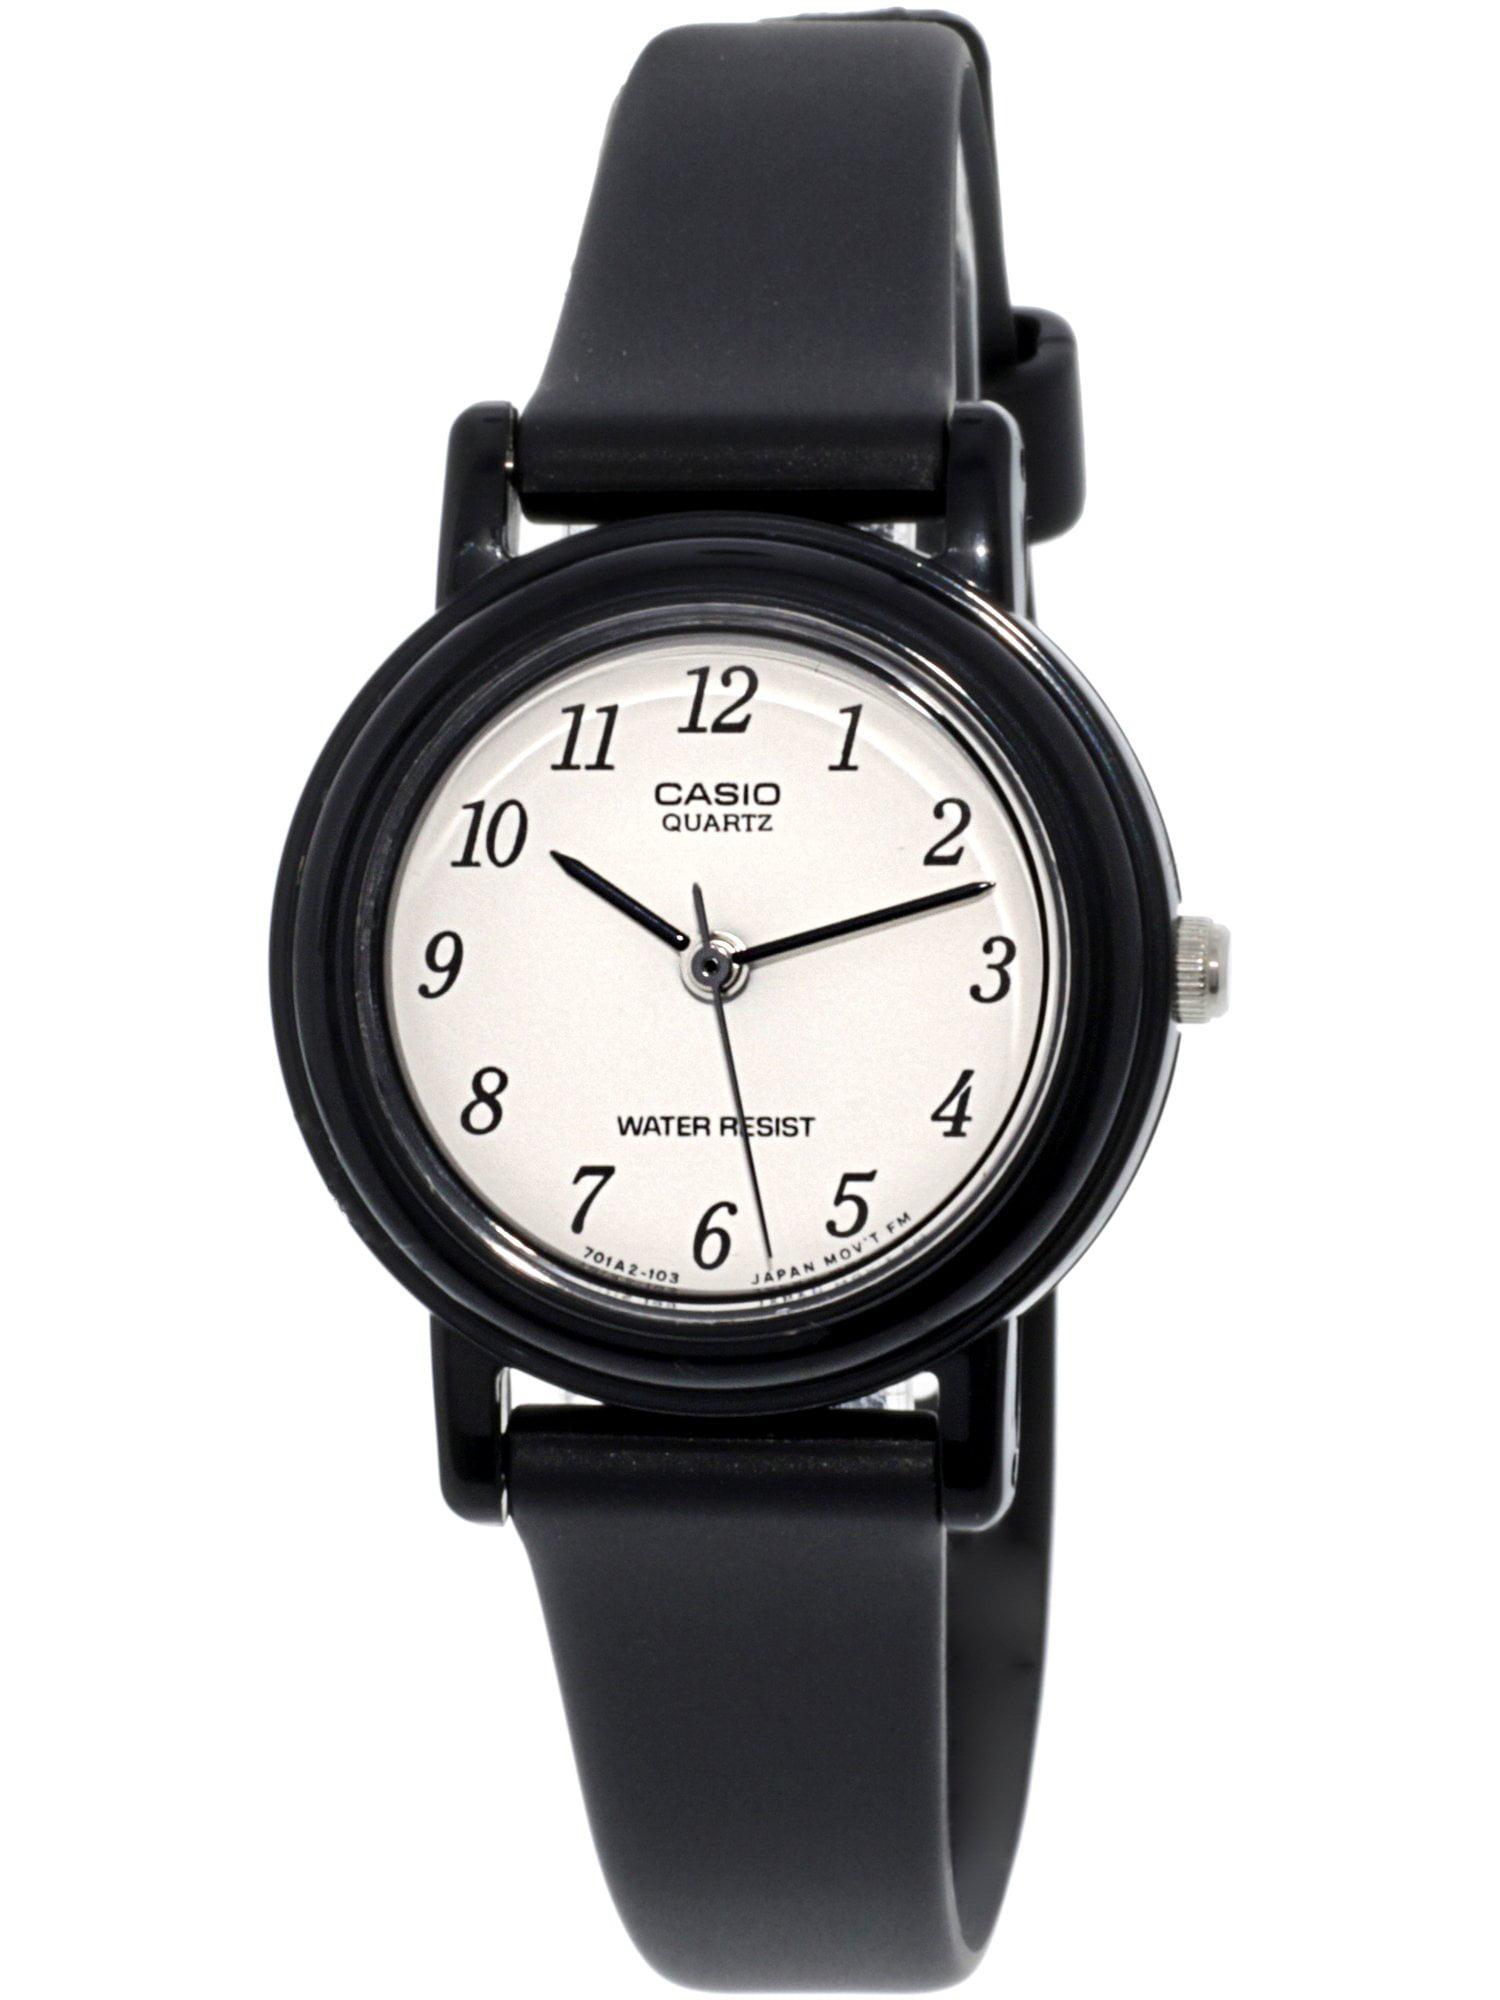 Casio women 39 s lq139bmv 1b black resin quartz fashion watch for Black resin ladies watch